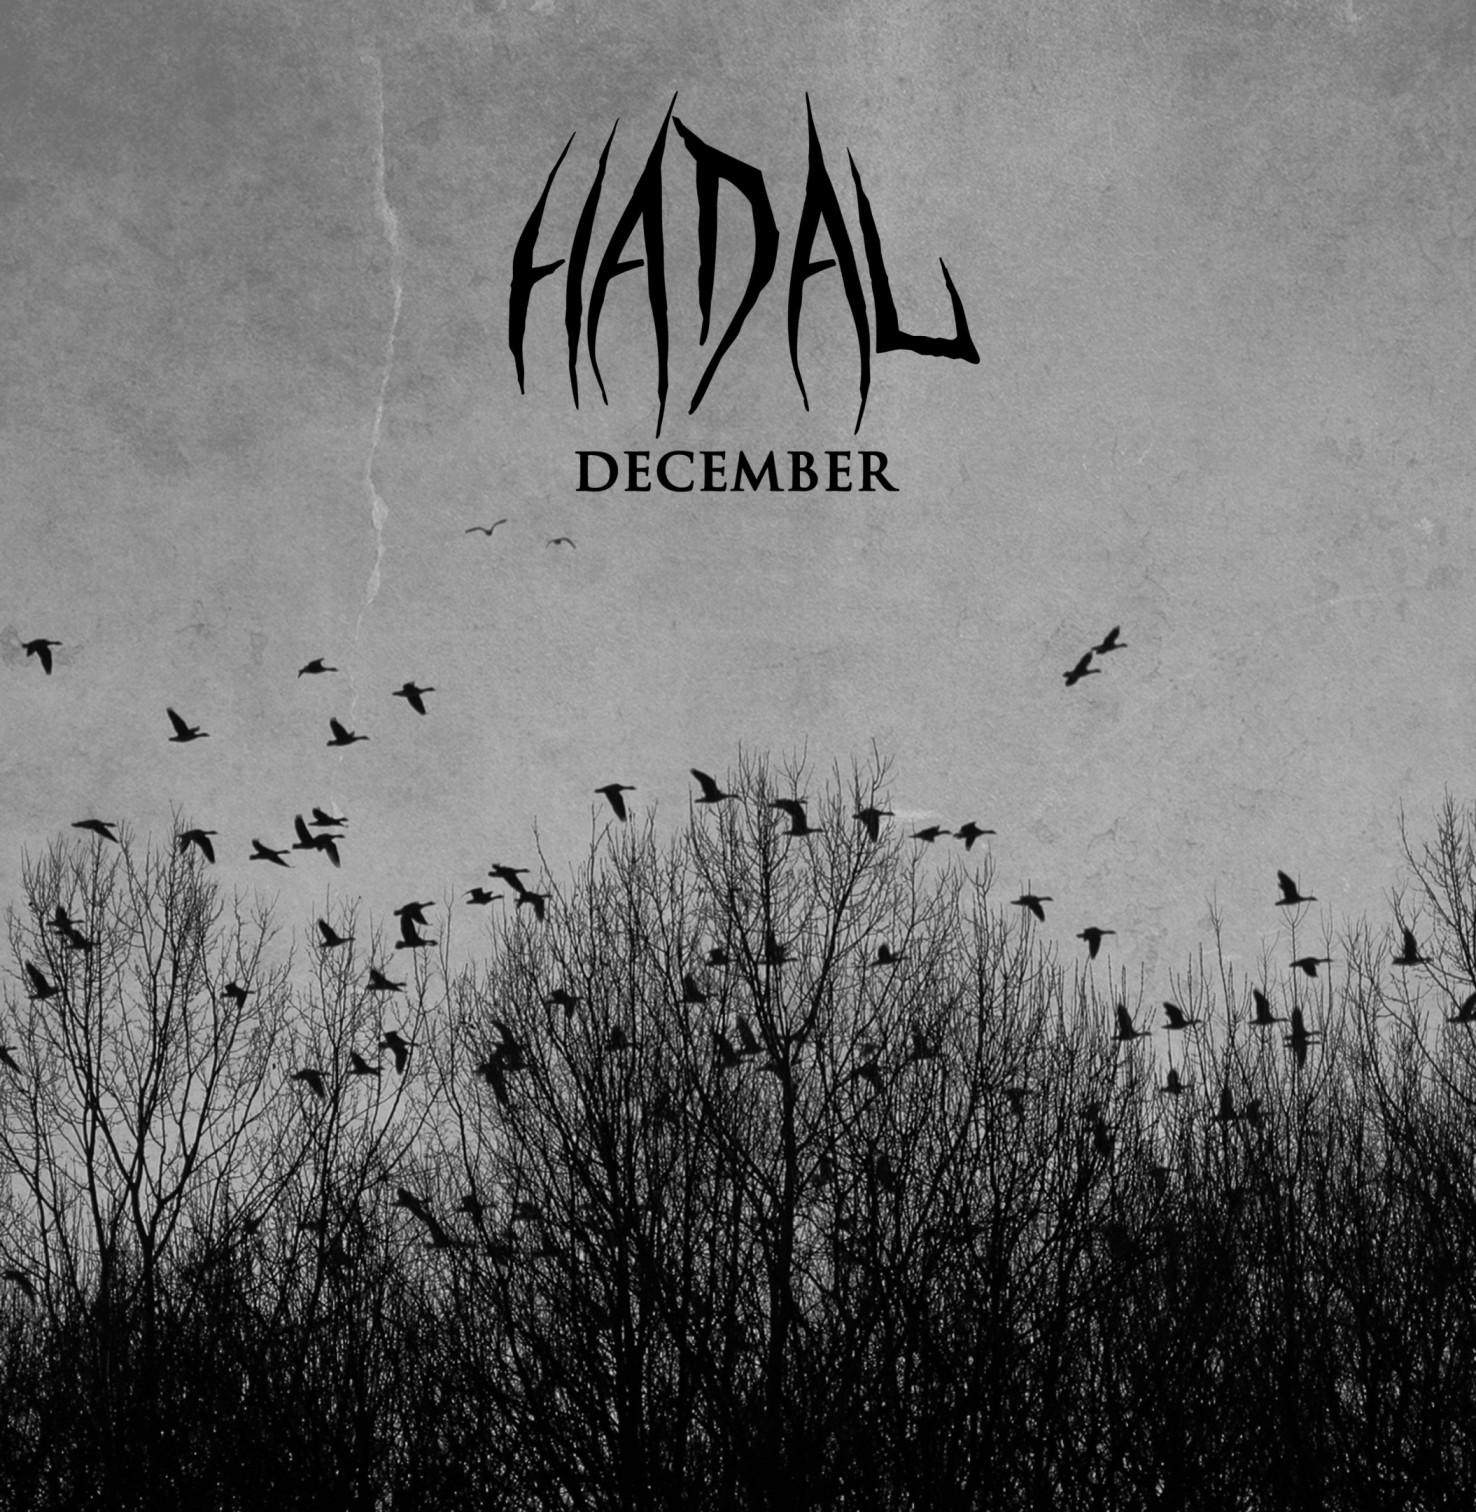 Hadal December Cover Artwork